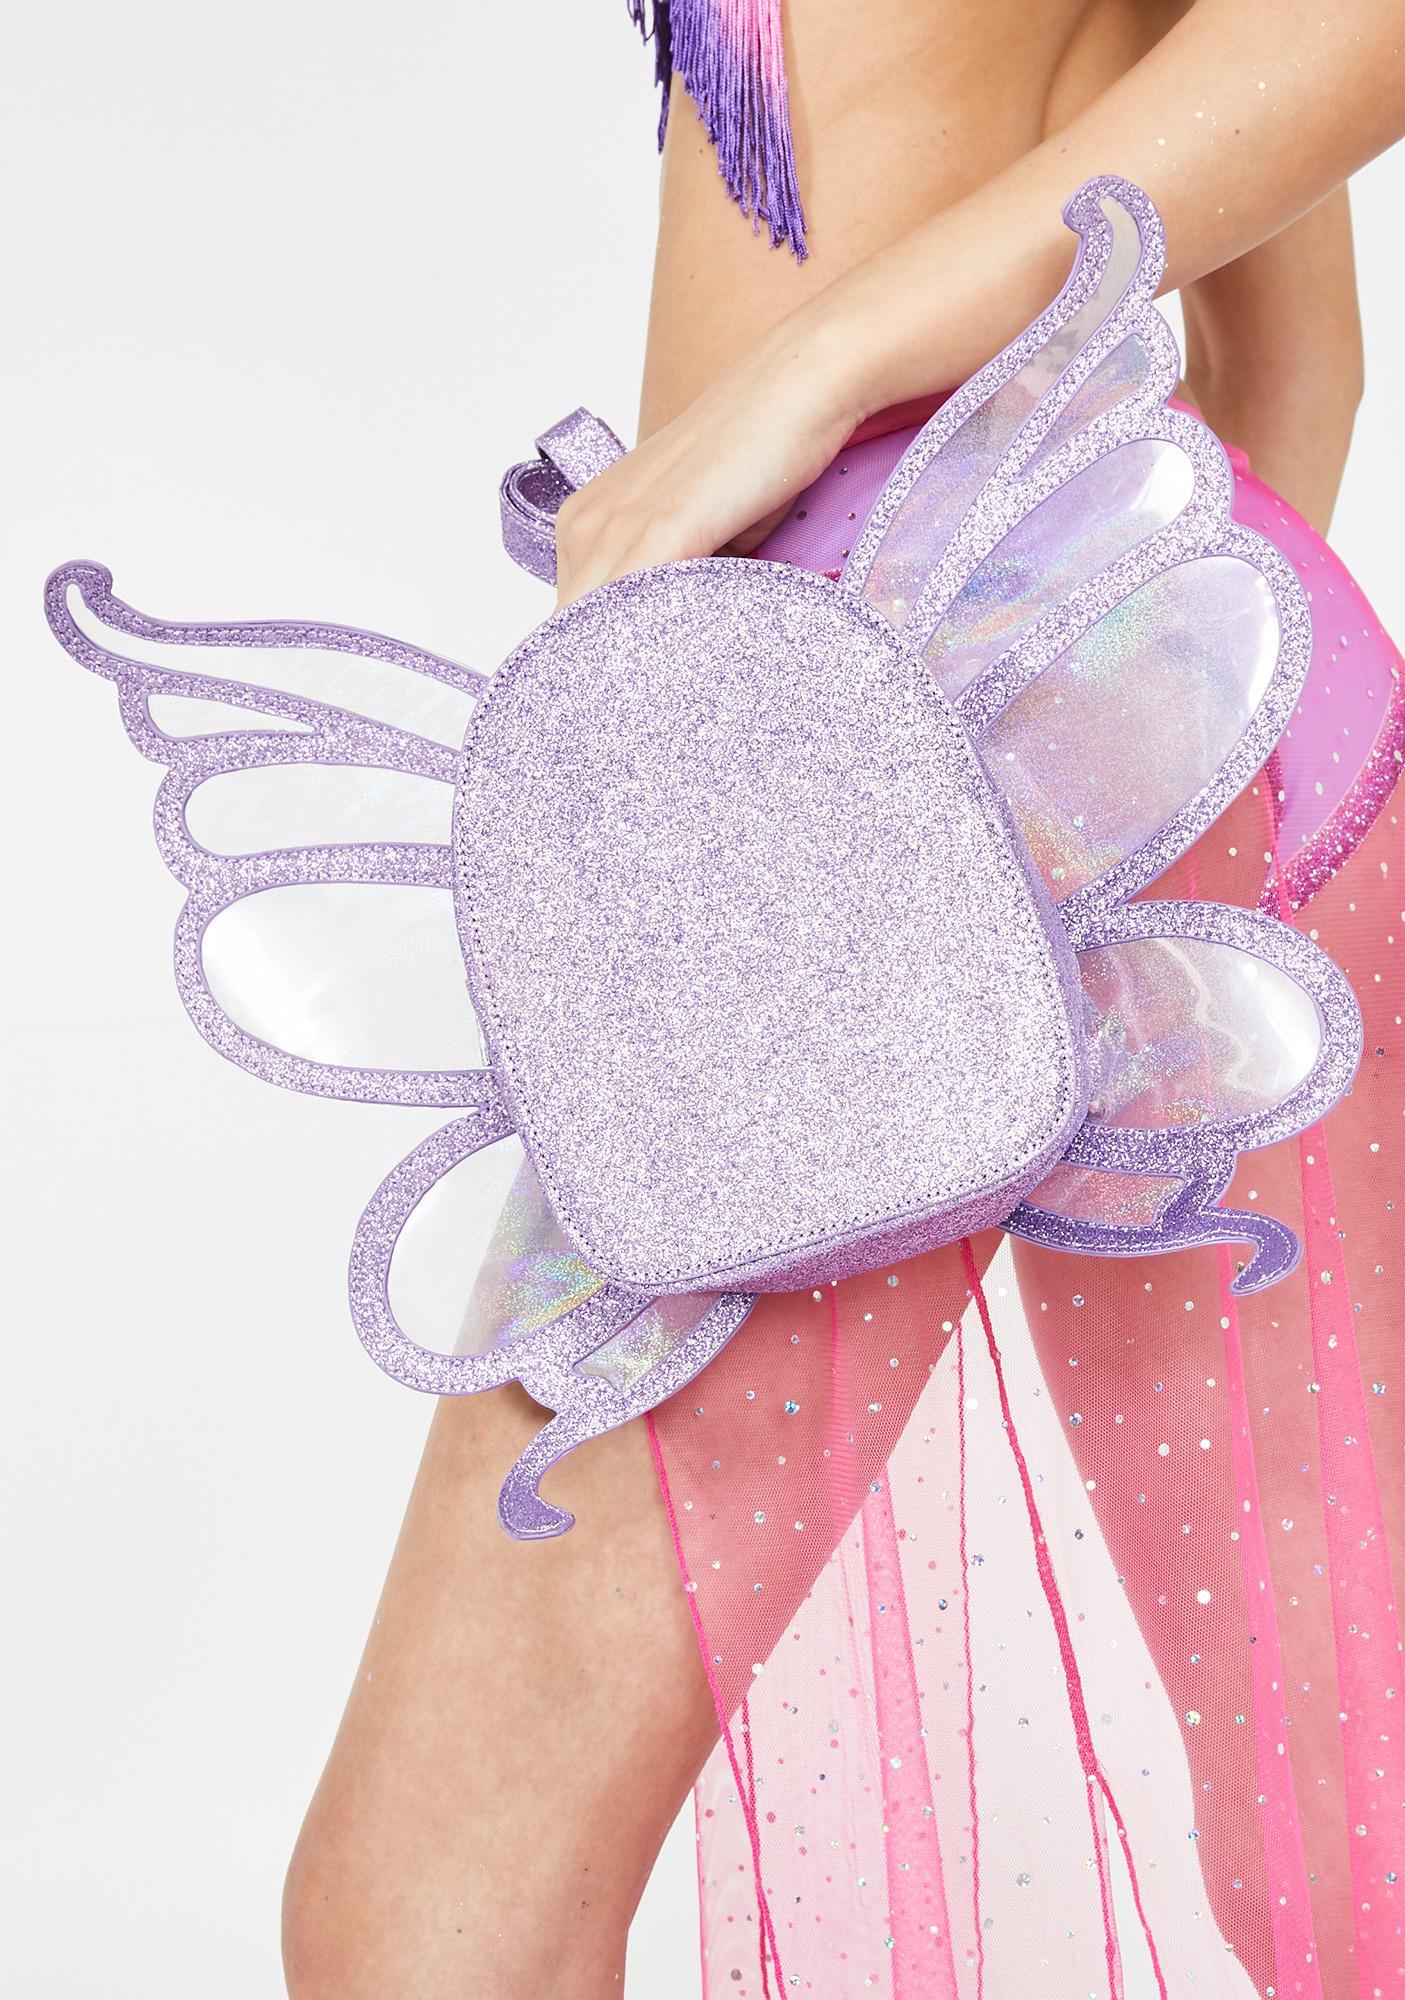 Club Exx Fairy Flossin' Mini Backpack